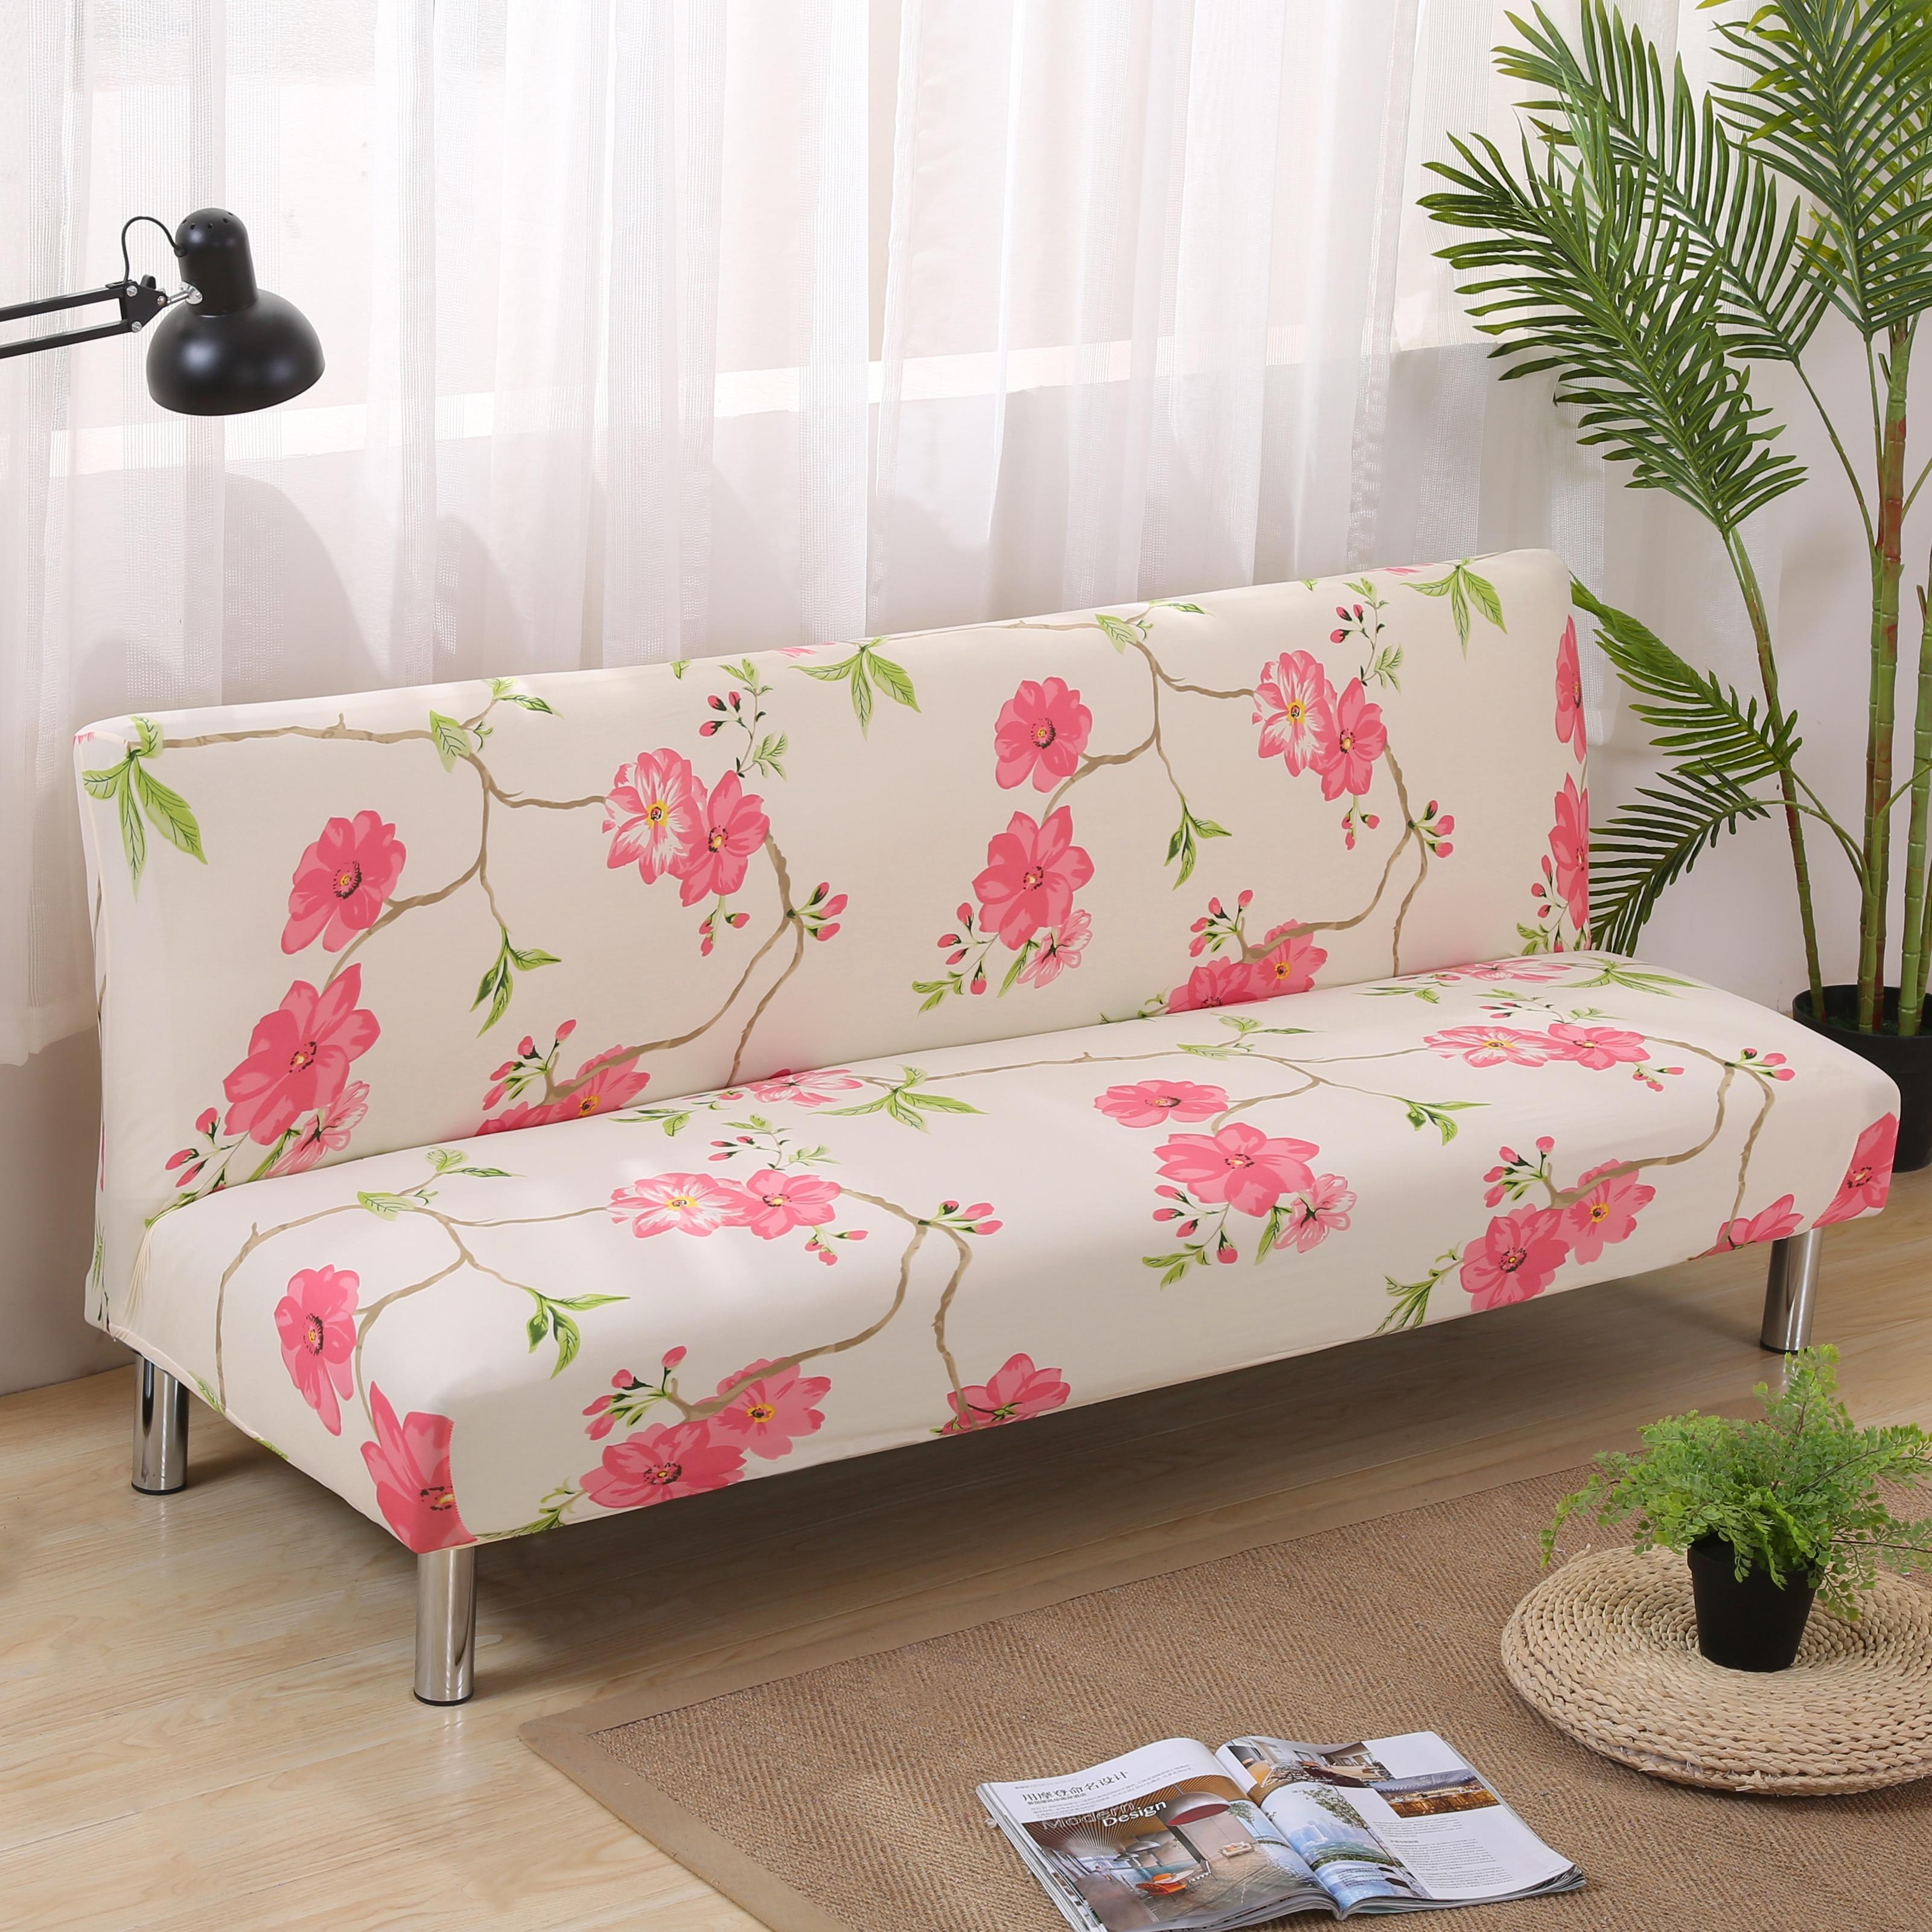 stretch sofa covers elastic no handrail folding sofa bed. Black Bedroom Furniture Sets. Home Design Ideas